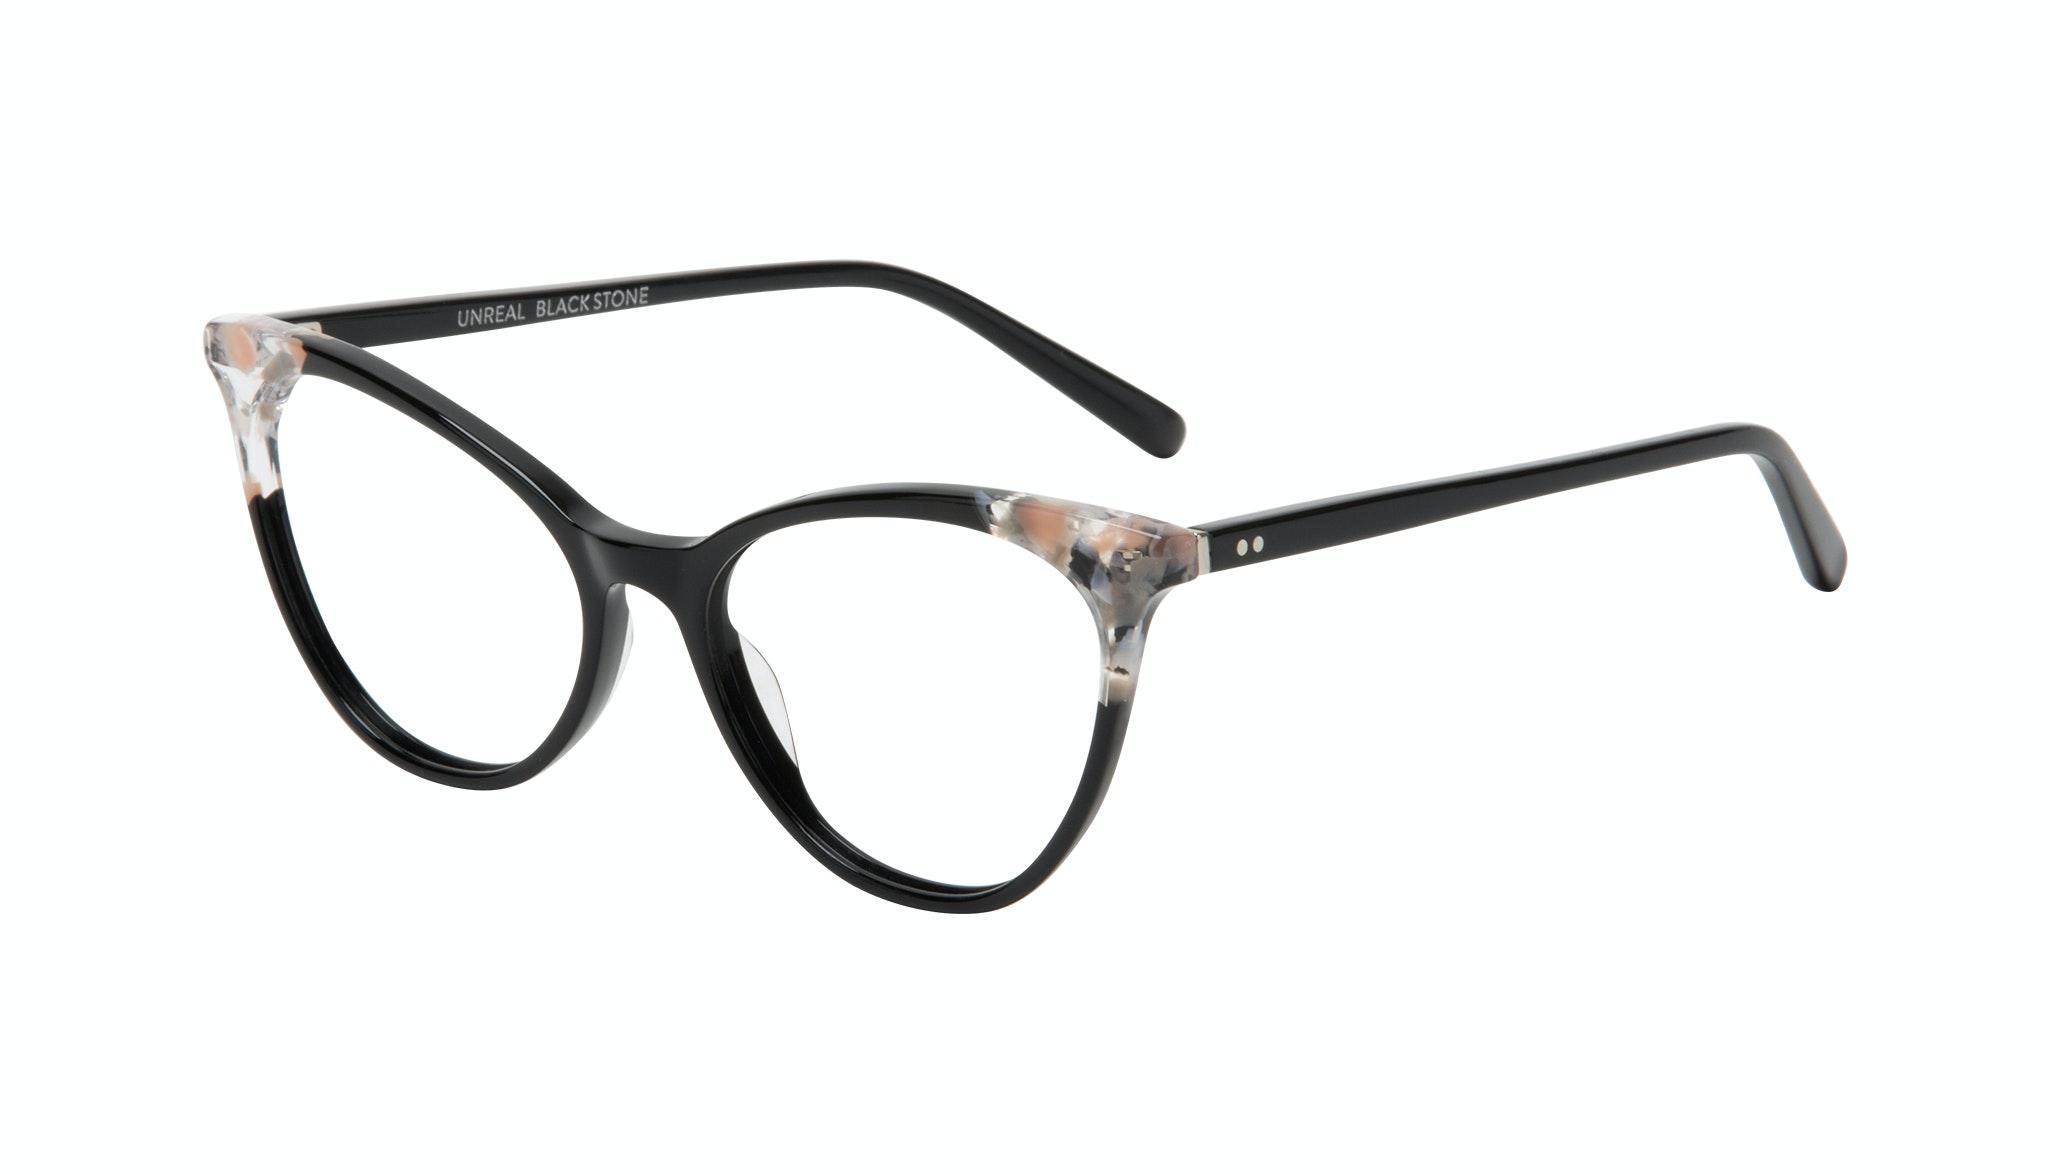 Affordable Fashion Glasses Cat Eye Eyeglasses Women Unreal Black Stone Tilt